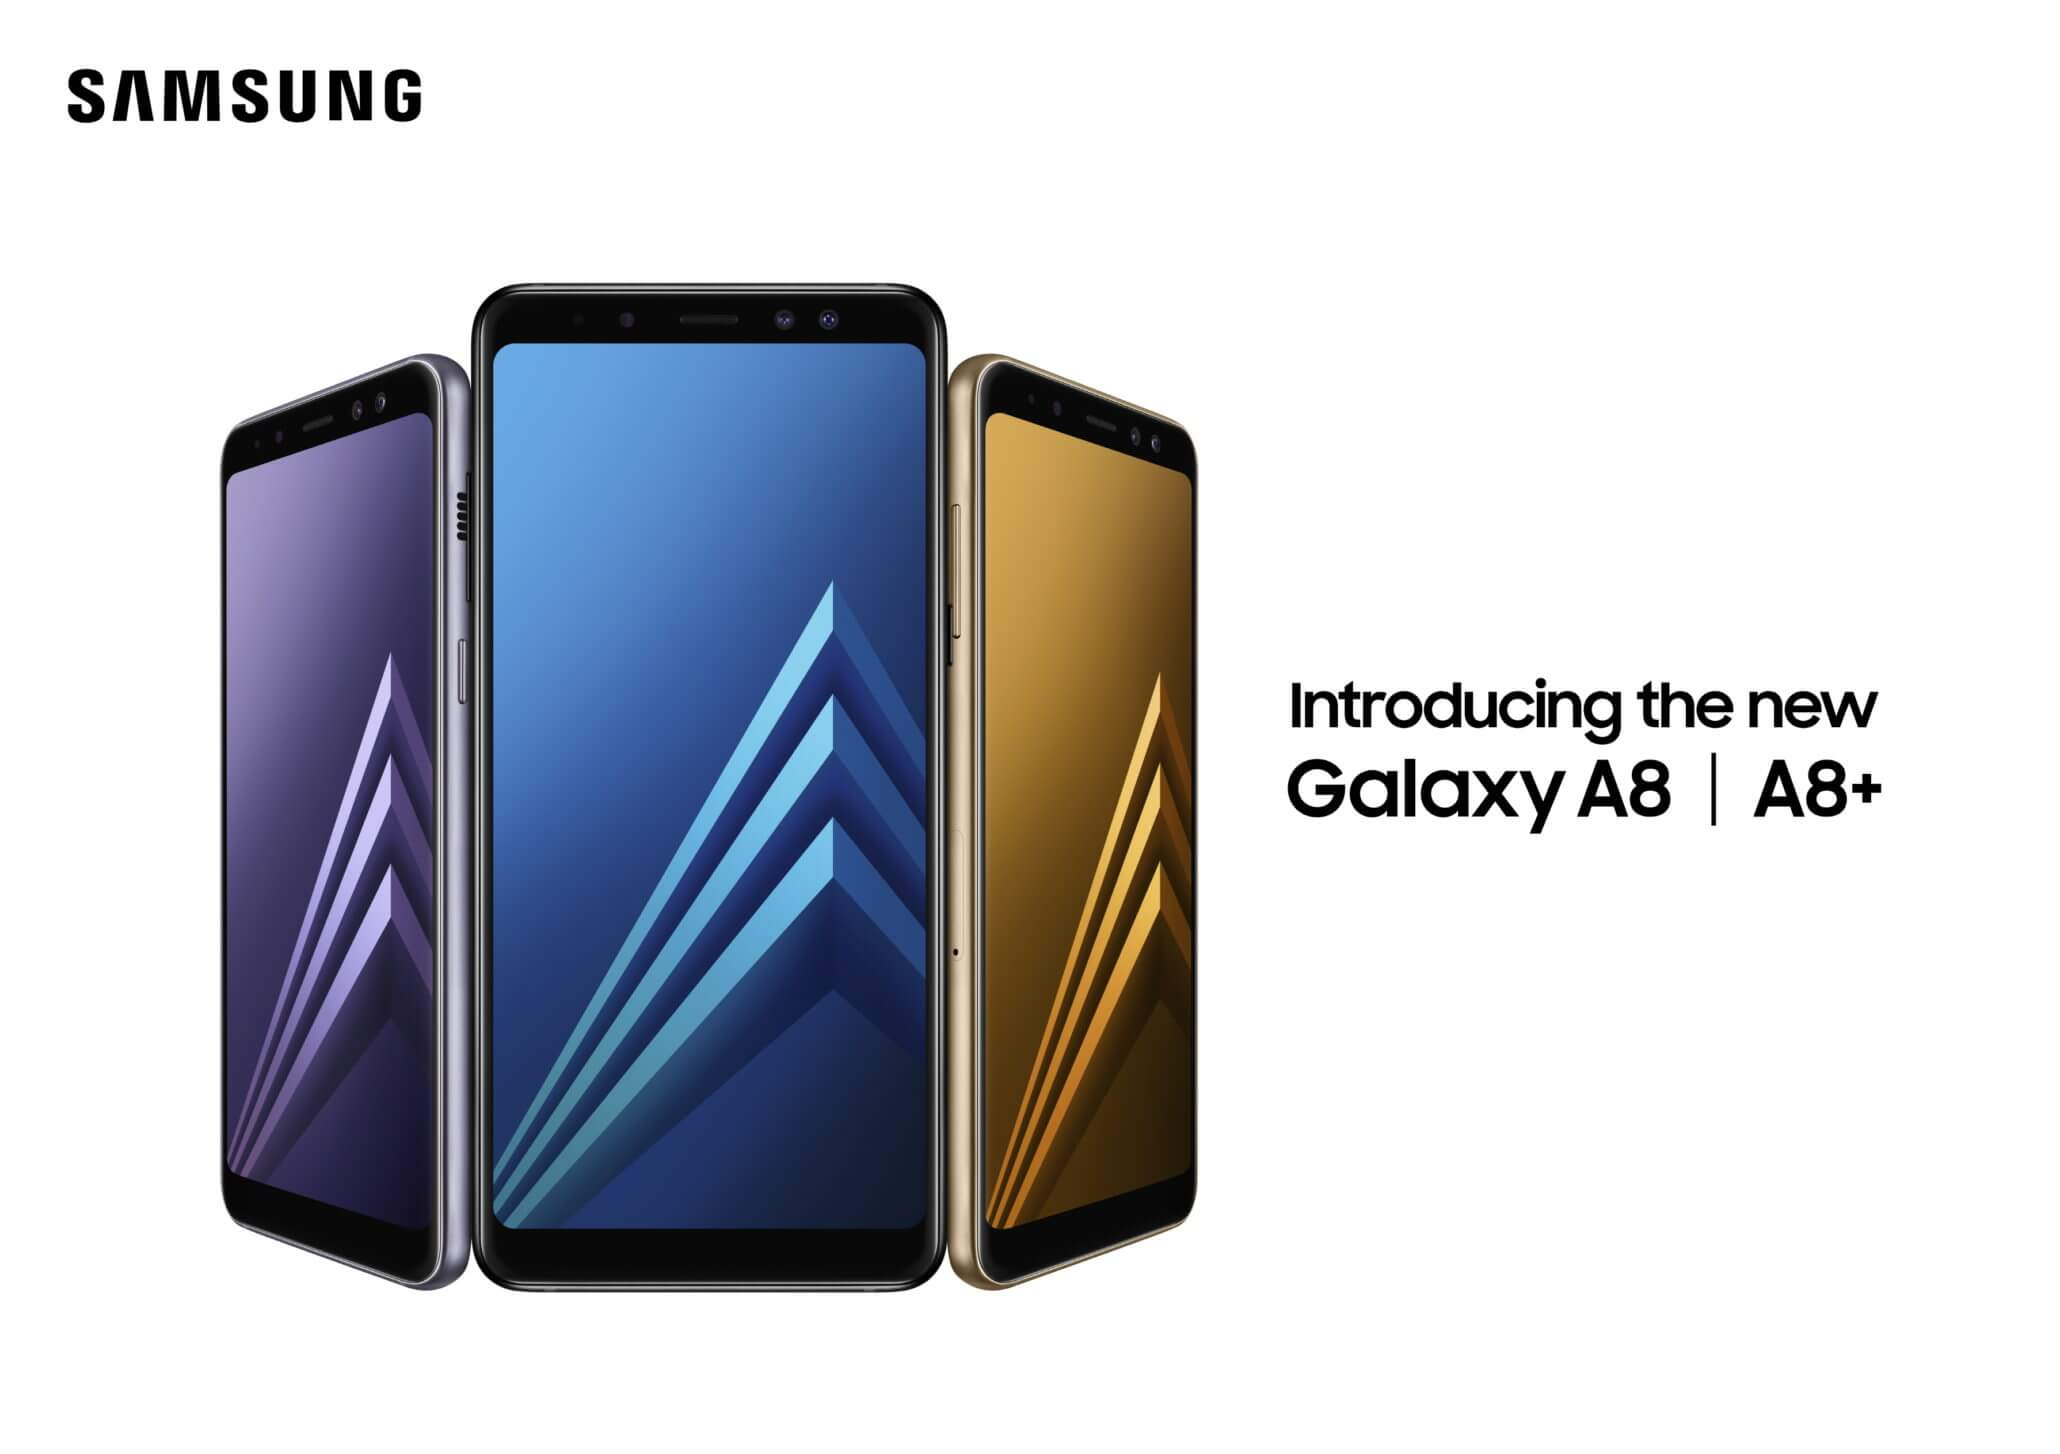 Bon plan : Samsung Galaxy A8 2018 à 219 euros chez Darty !